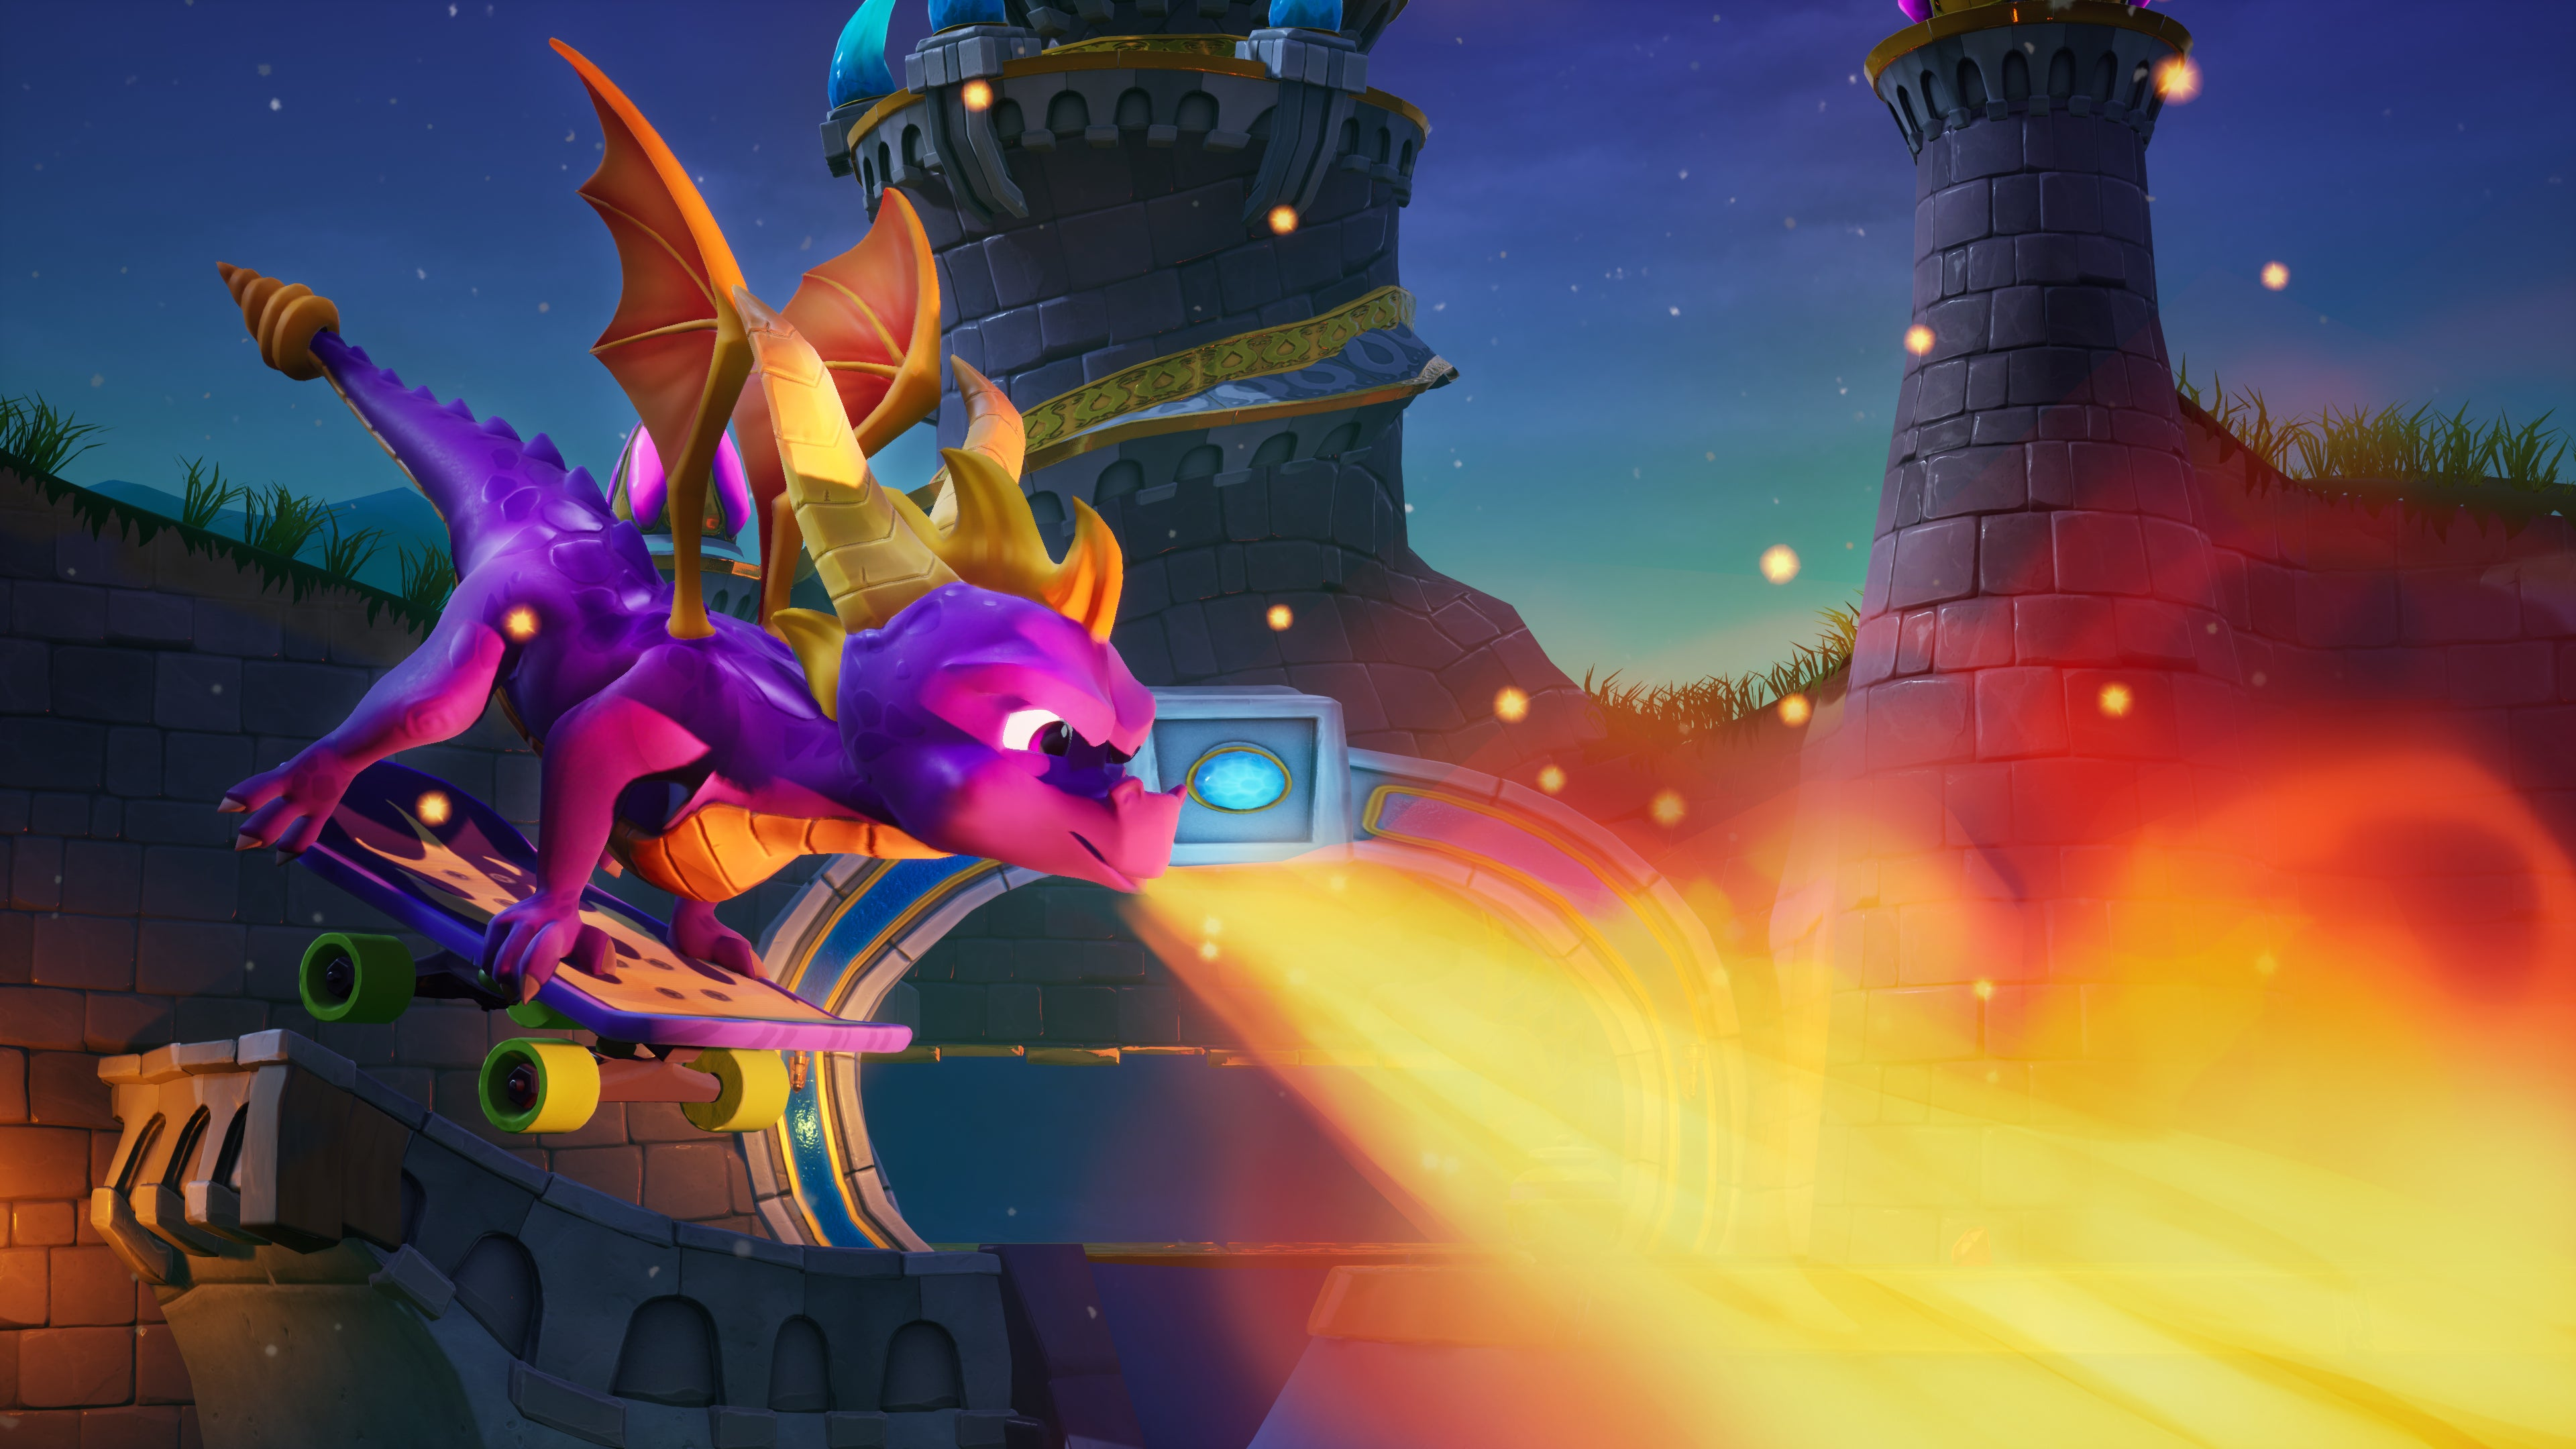 Spyro Reignited 4k Wallpaper